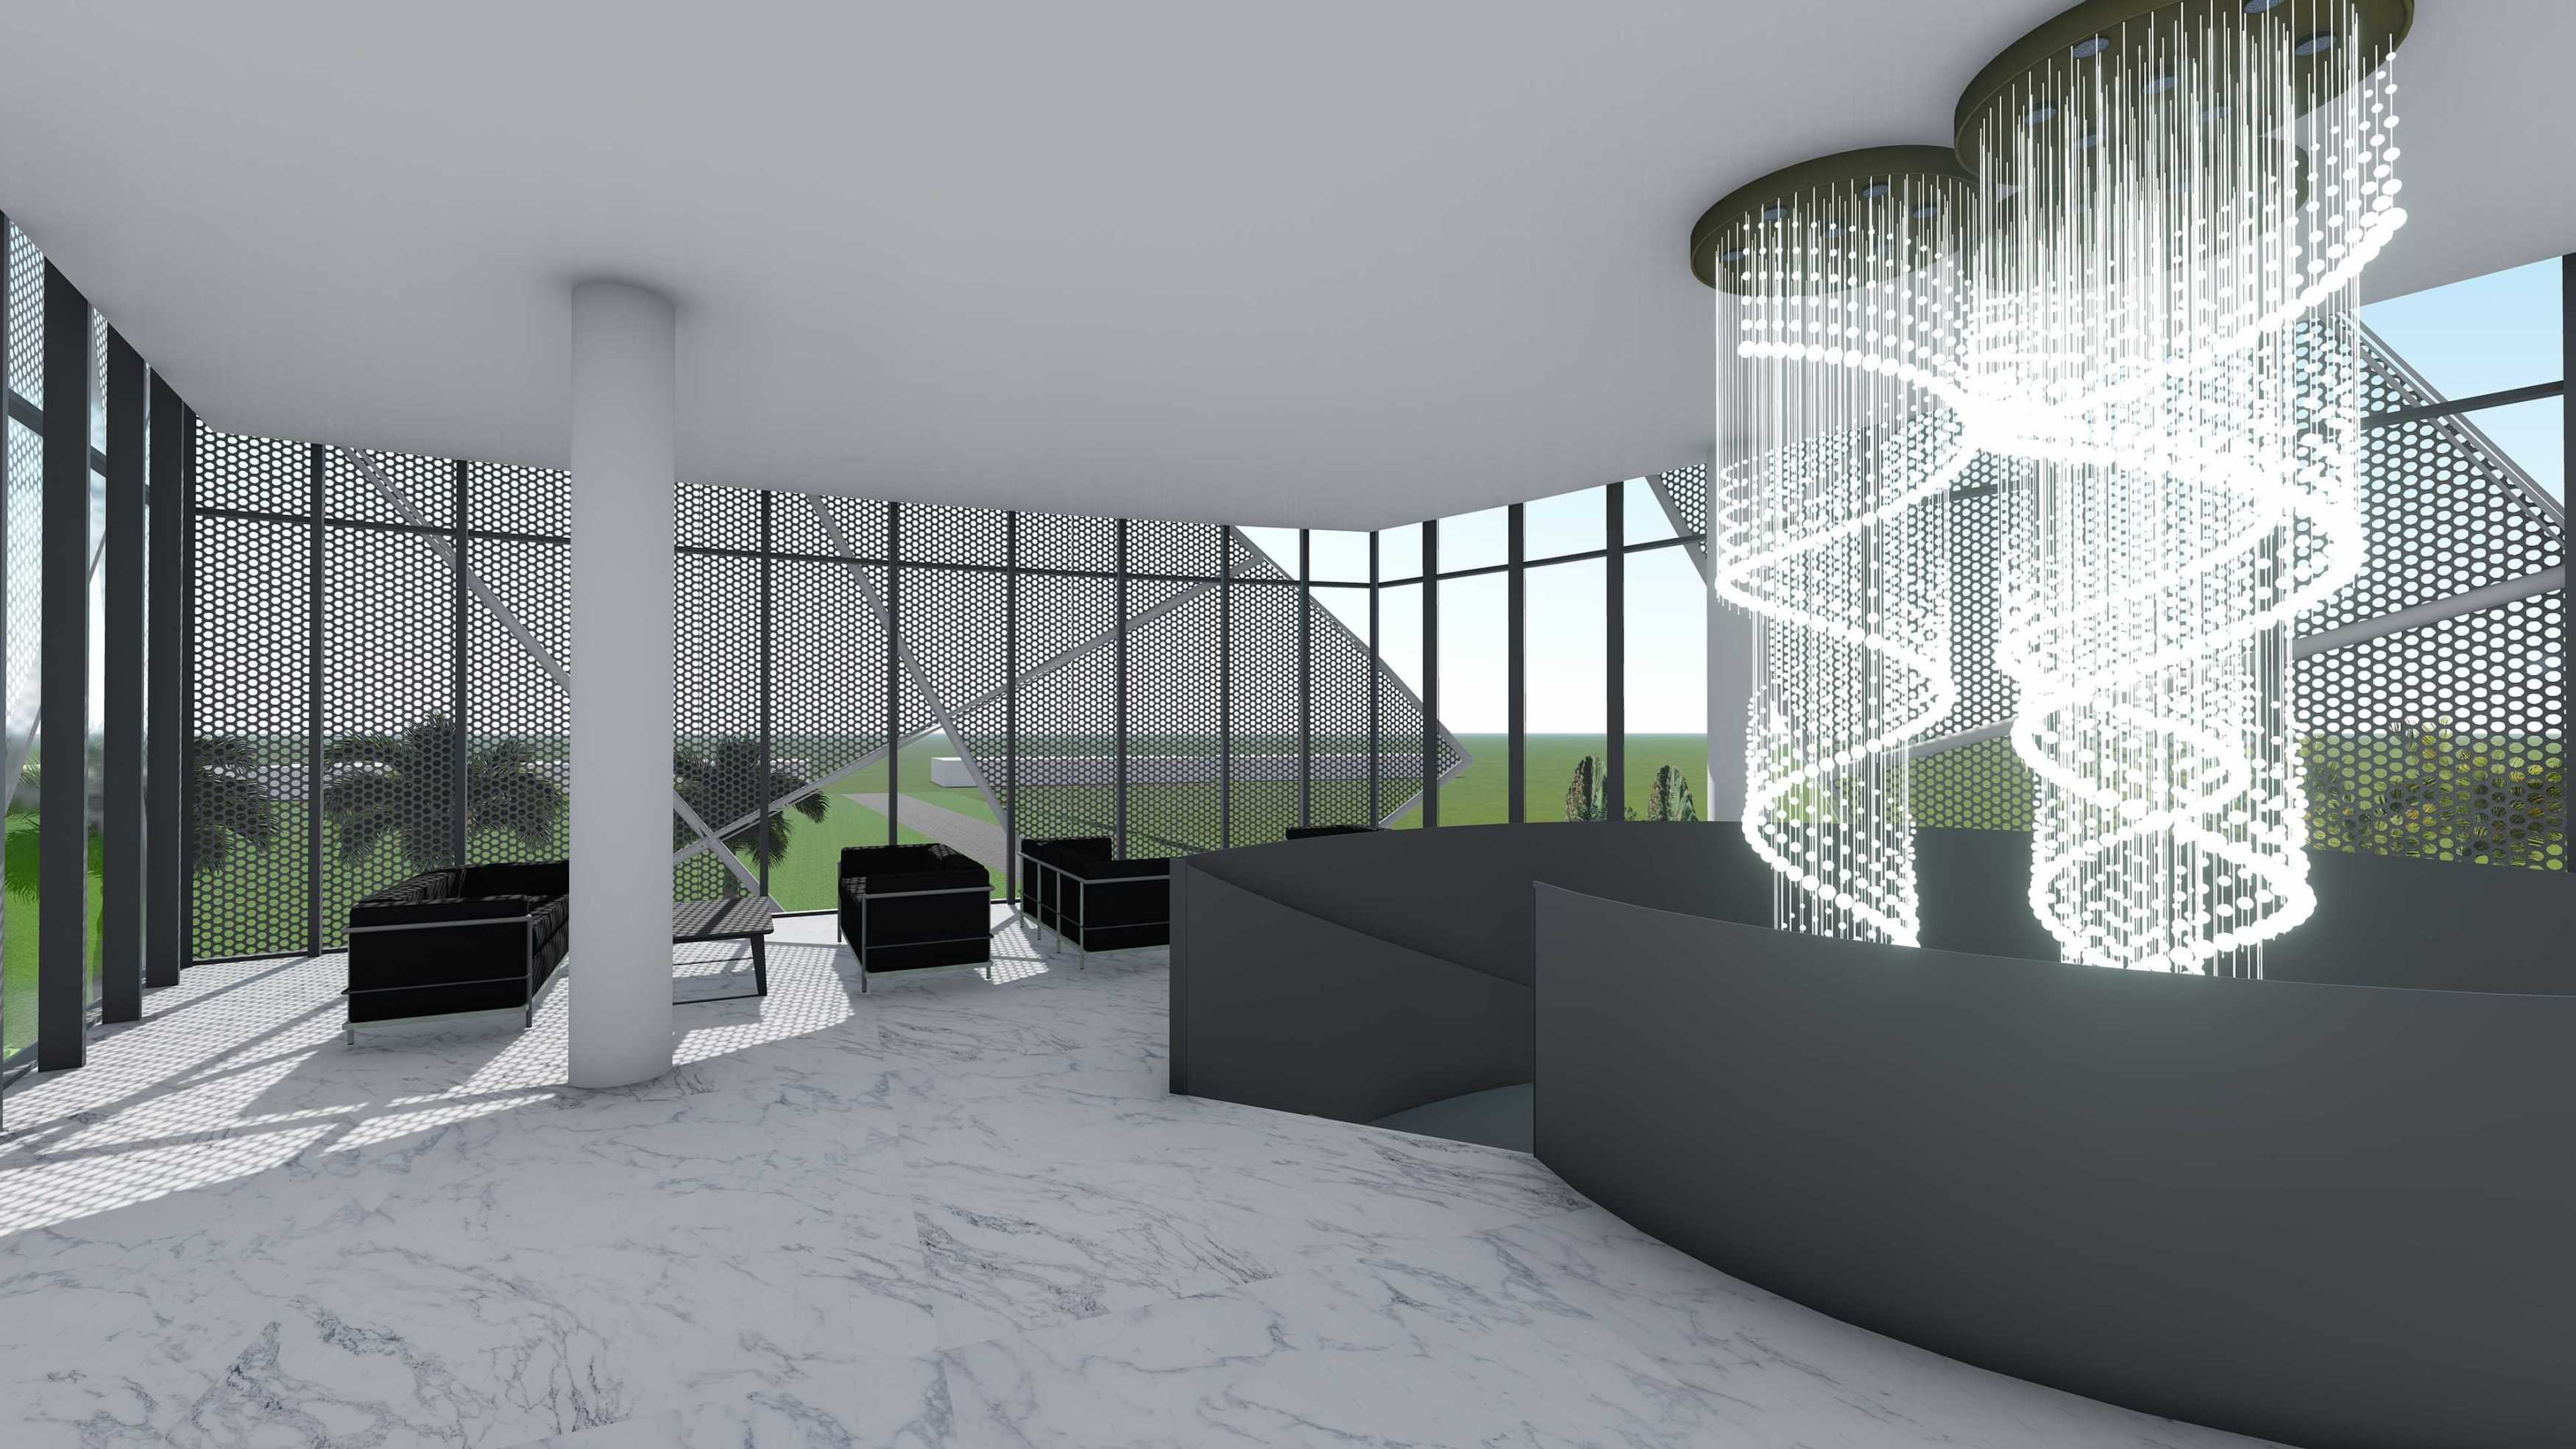 Raaj Gill Arsitek Aari Office Building & Laboratory #1 Pekanbaru, Kota Pekanbaru, Riau, Indonesia Pekanbaru, Kota Pekanbaru, Riau, Indonesia Raaj-Gill-Arsitek-Aari-Office-Building-Laboratory   74668